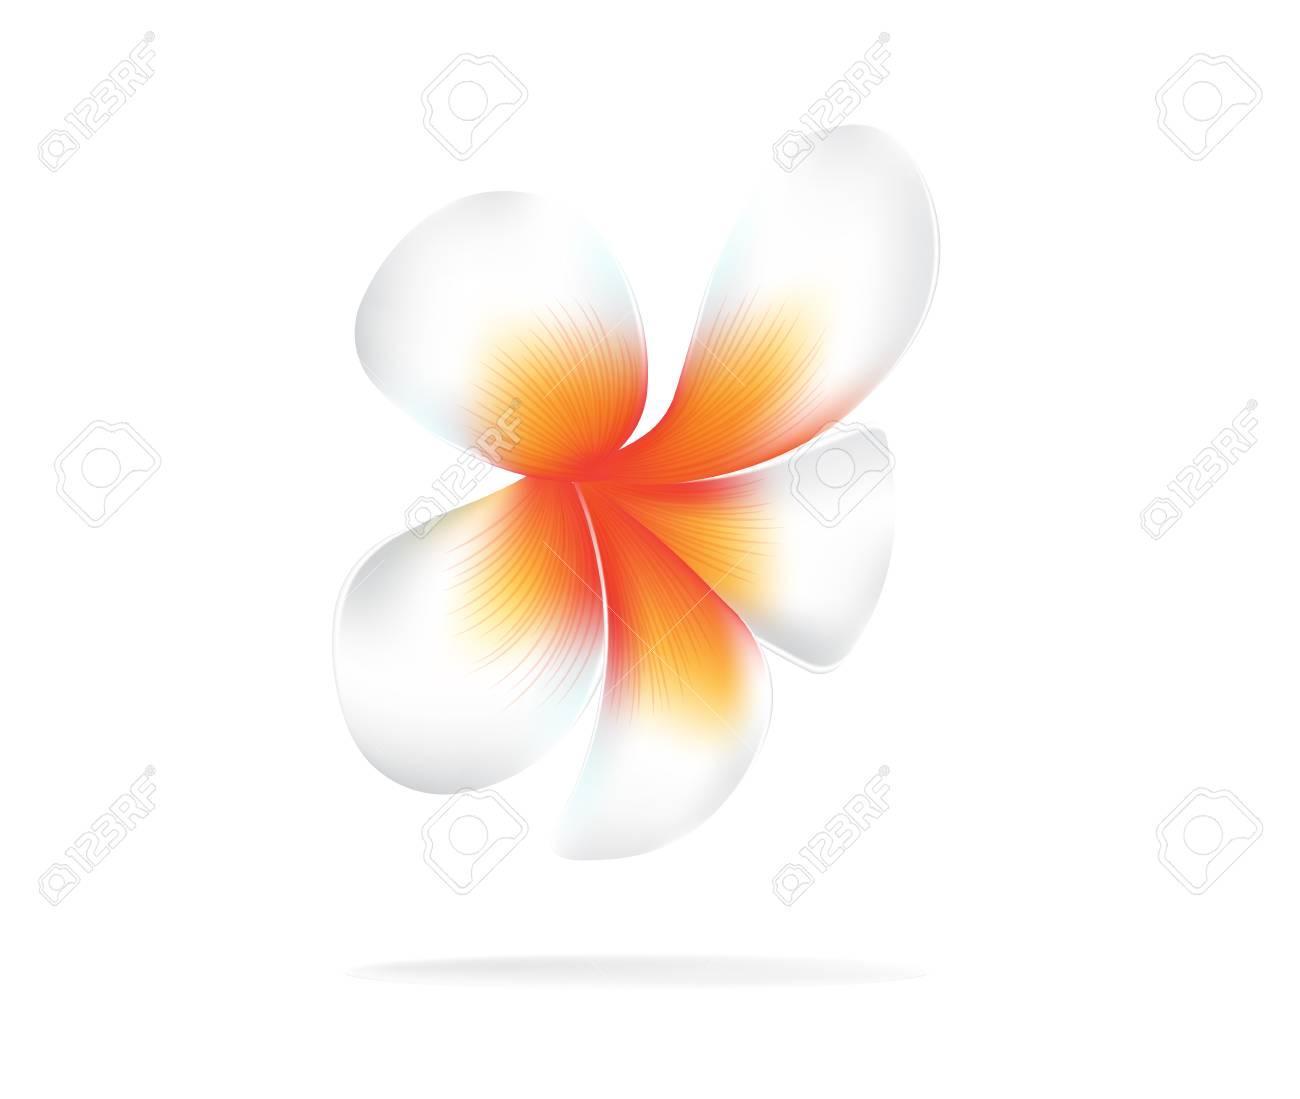 Illustration Vector Of Hawaii Flower Frangipani White Plumeria